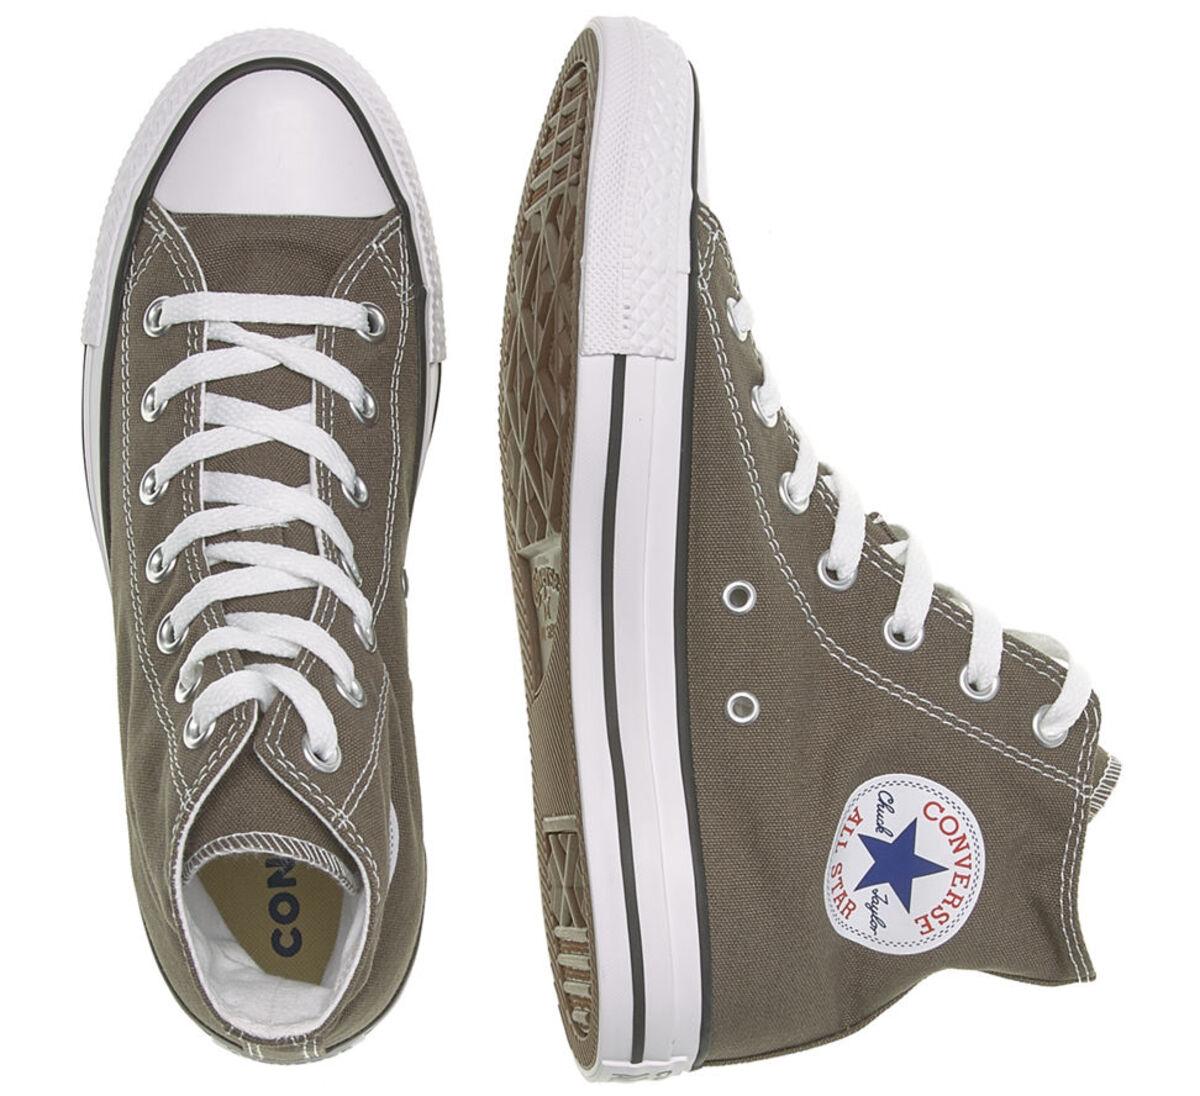 Bild 2 von Converse Sneaker - CHUCK TAYLOR ALL STAR HI